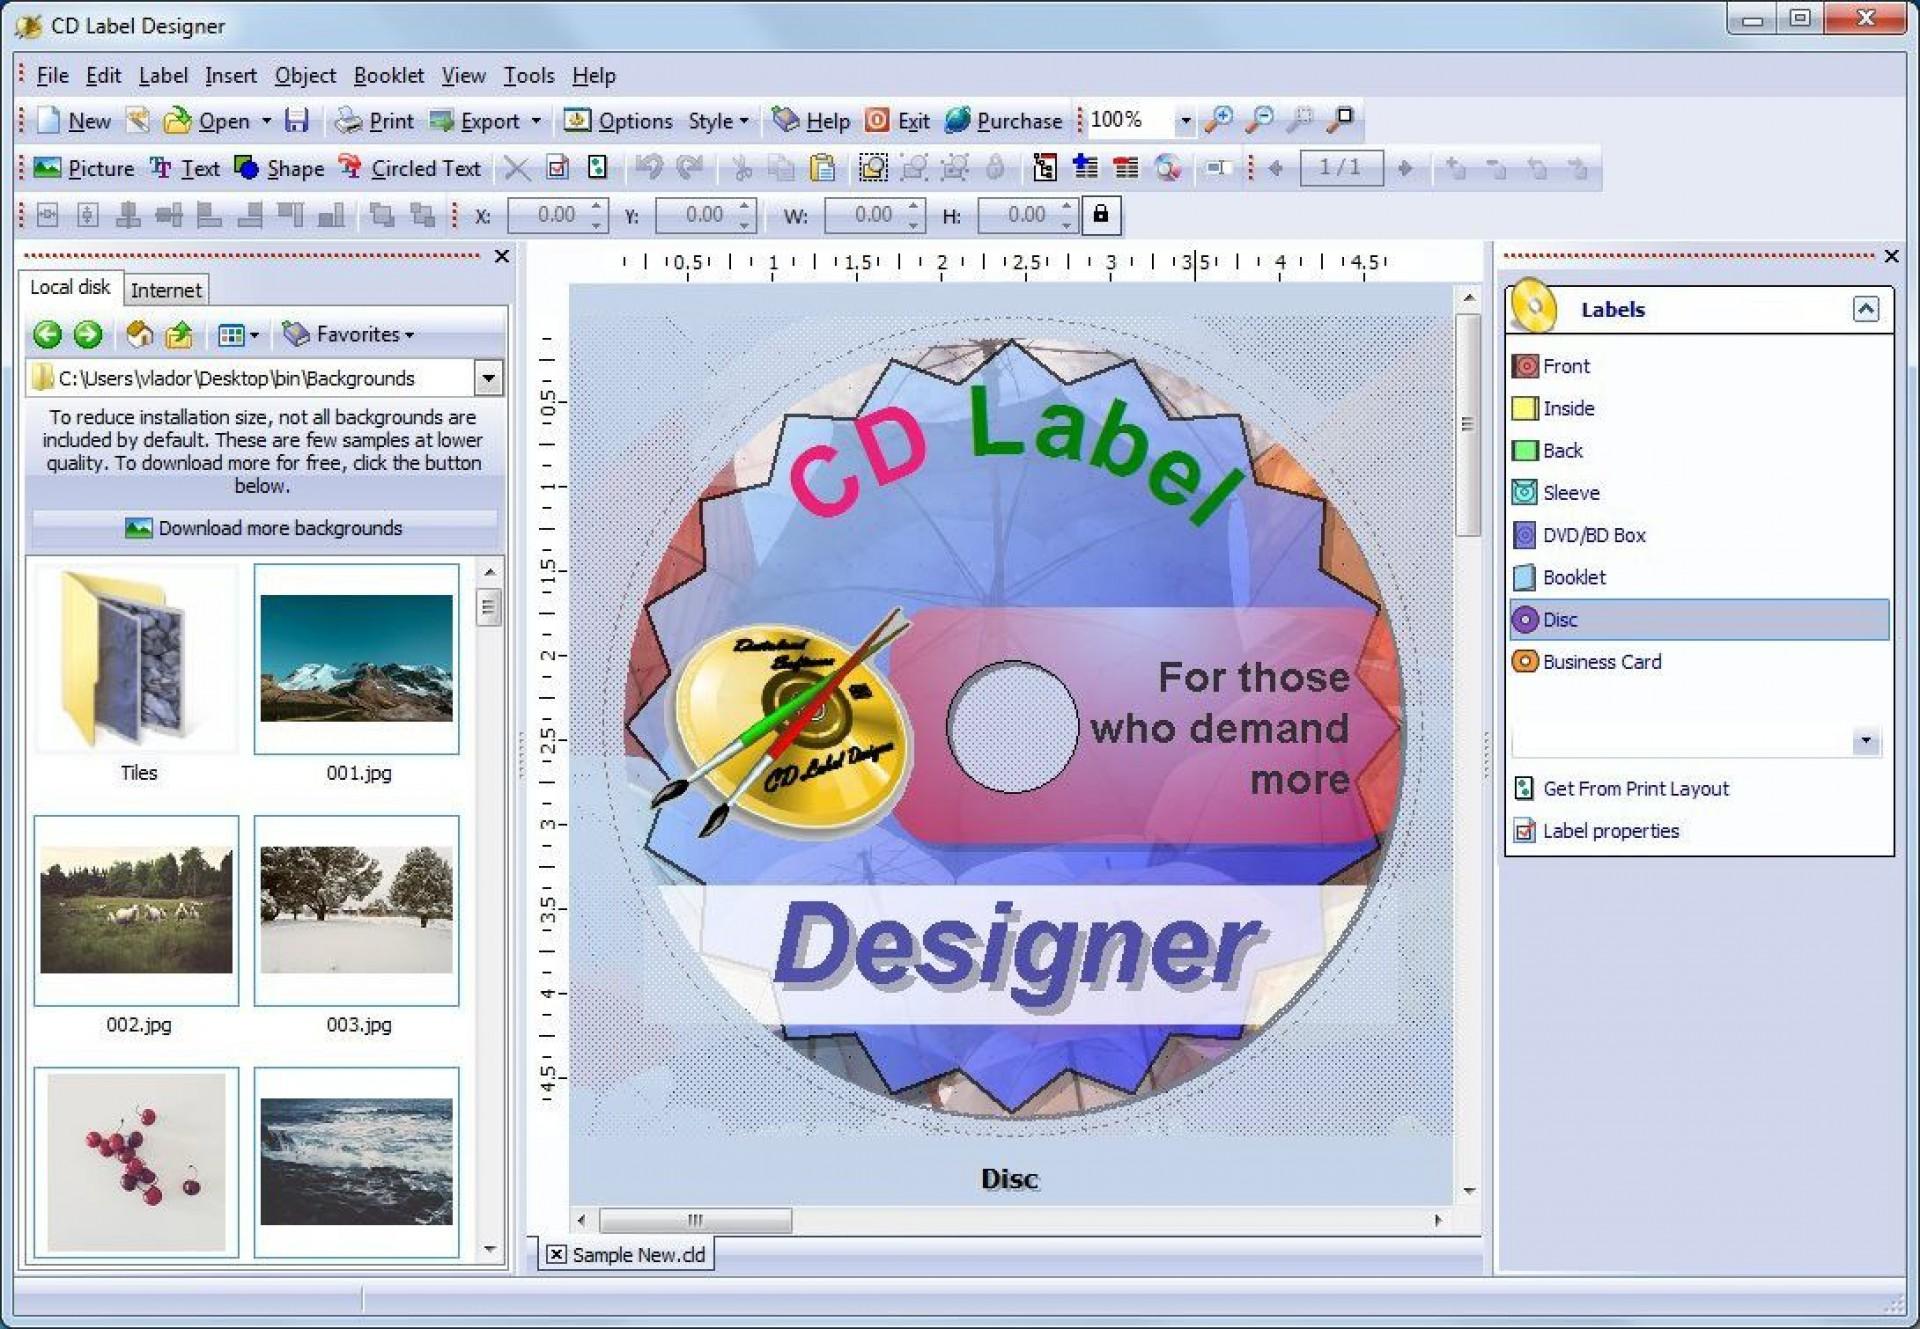 003 Singular Free Label Maker Template For Mac High Def 1920